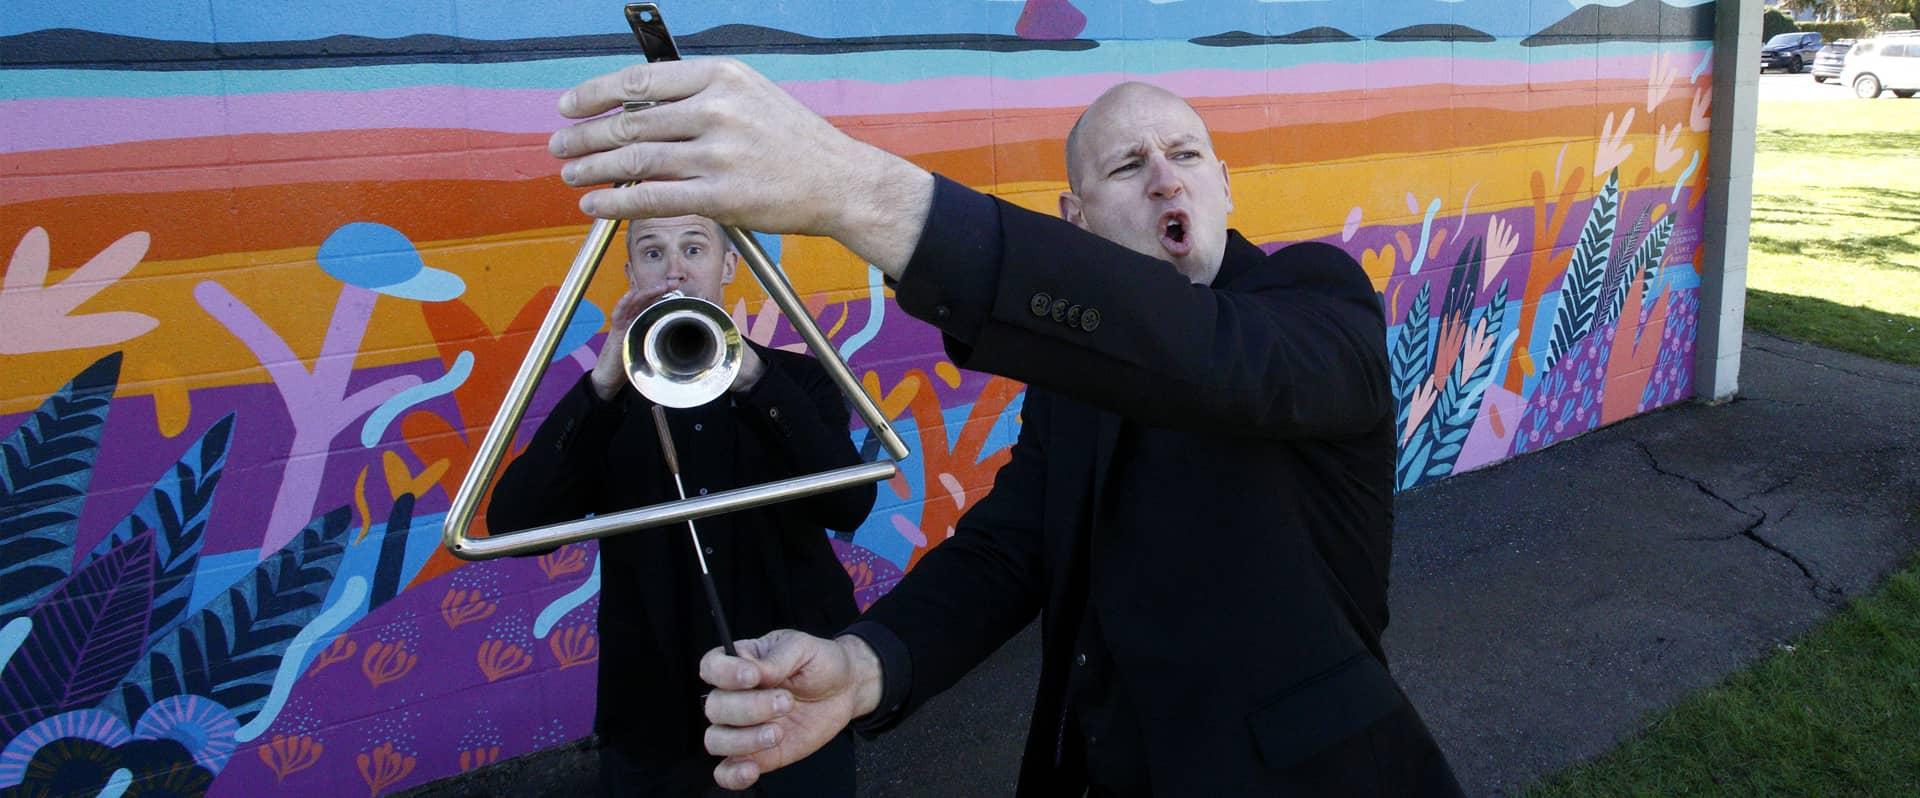 Percusion - percussion and trumpet - Victoria Symphony